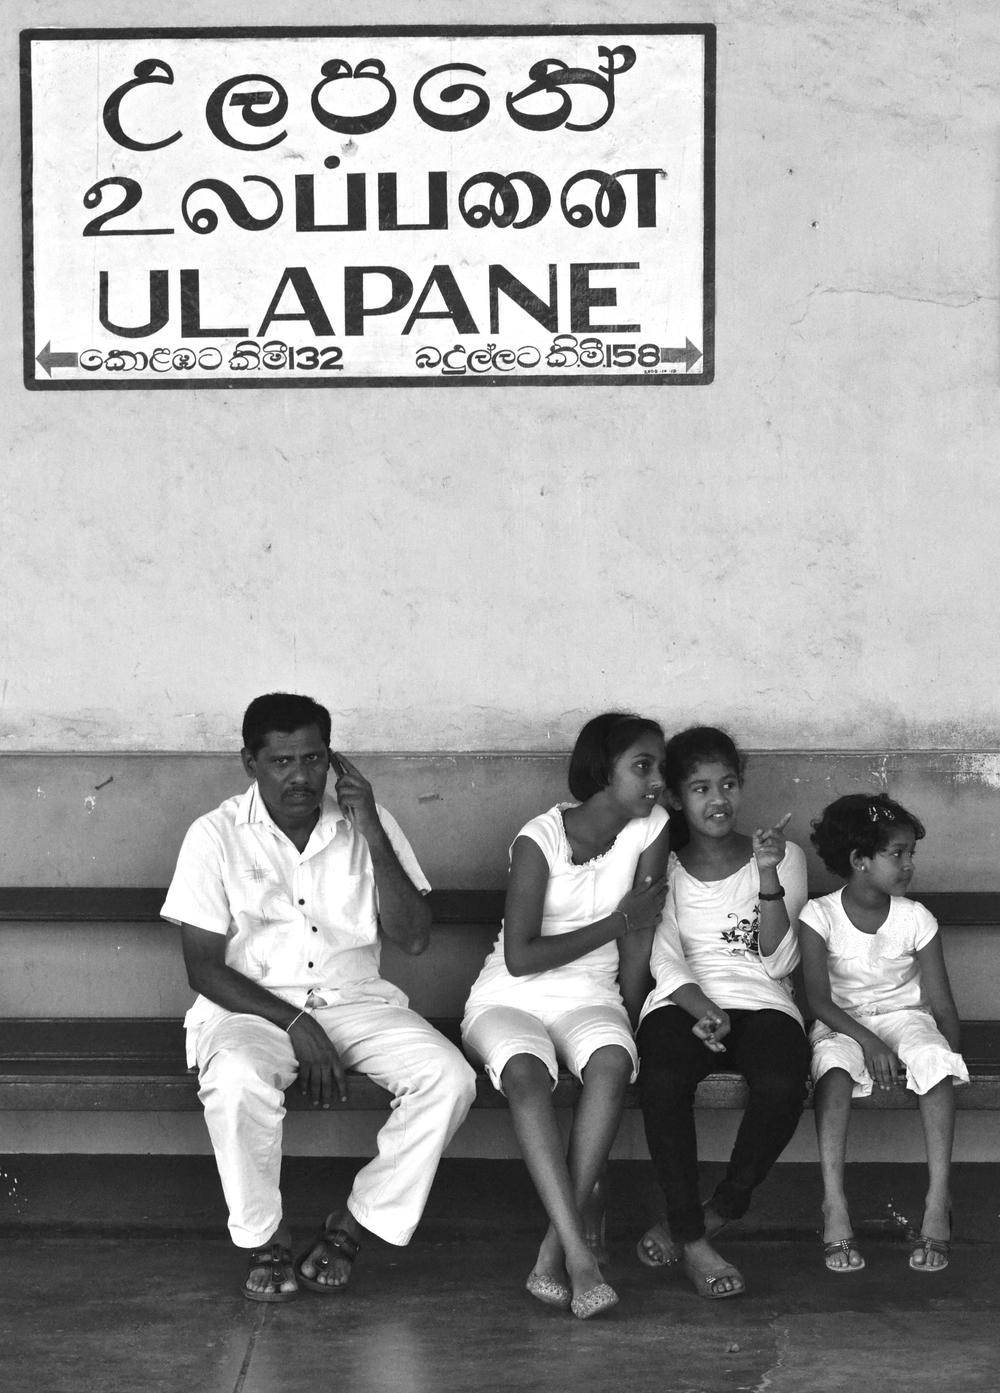 ULAPANE, SRI LANKA